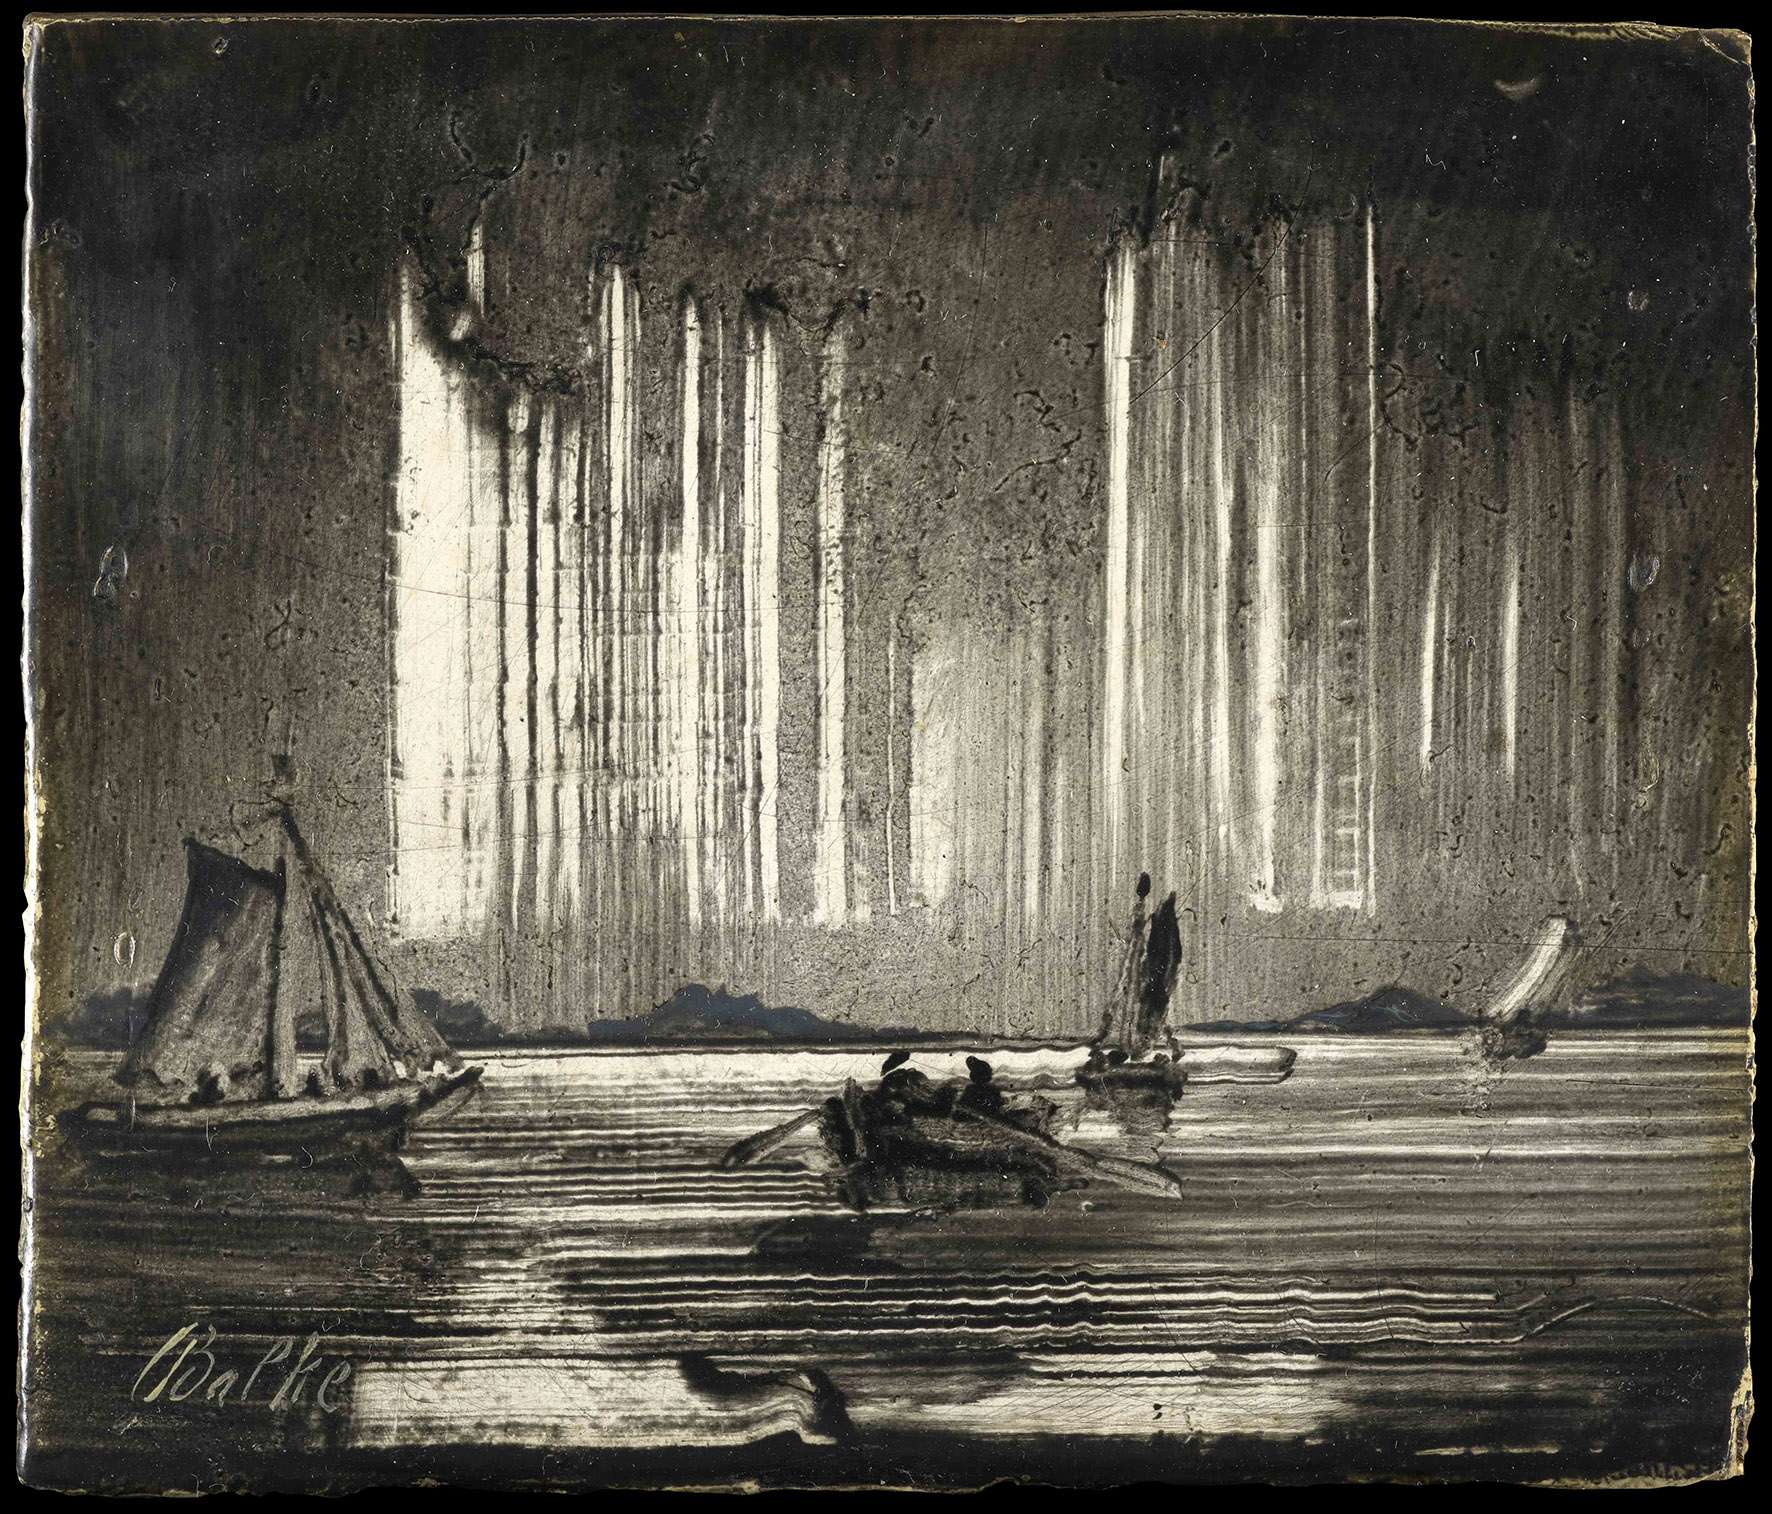 peder-balke-northern-lights-1870-trivium-art-history.jpg